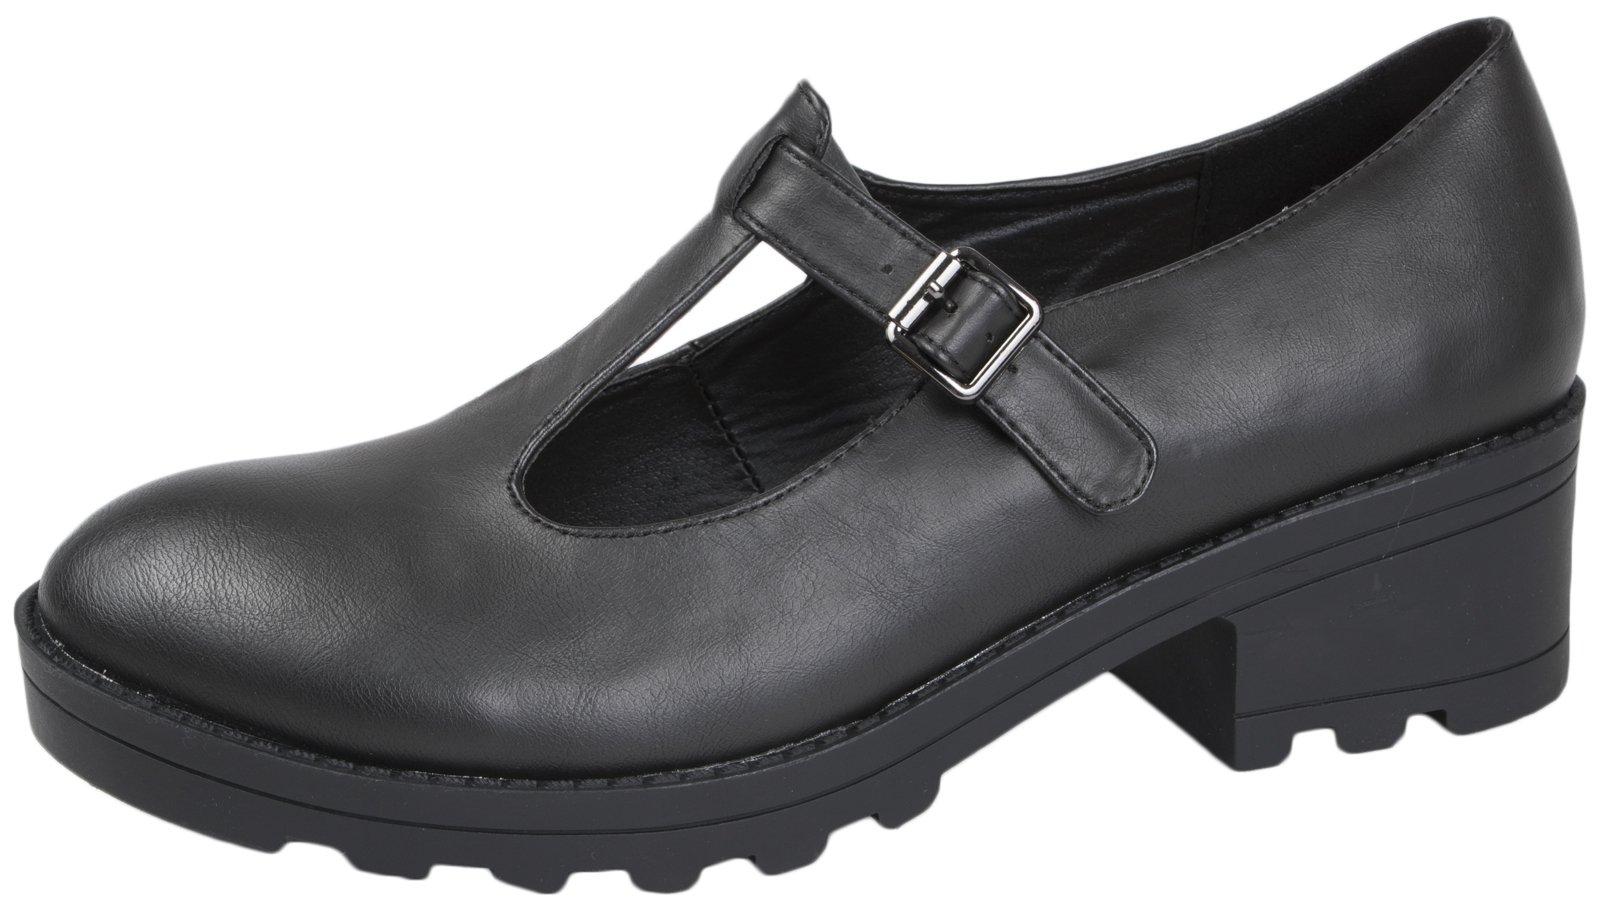 US Brass Girls Kids Childrens Black Matt Mary Janes School Shoes Size 8 UK Child